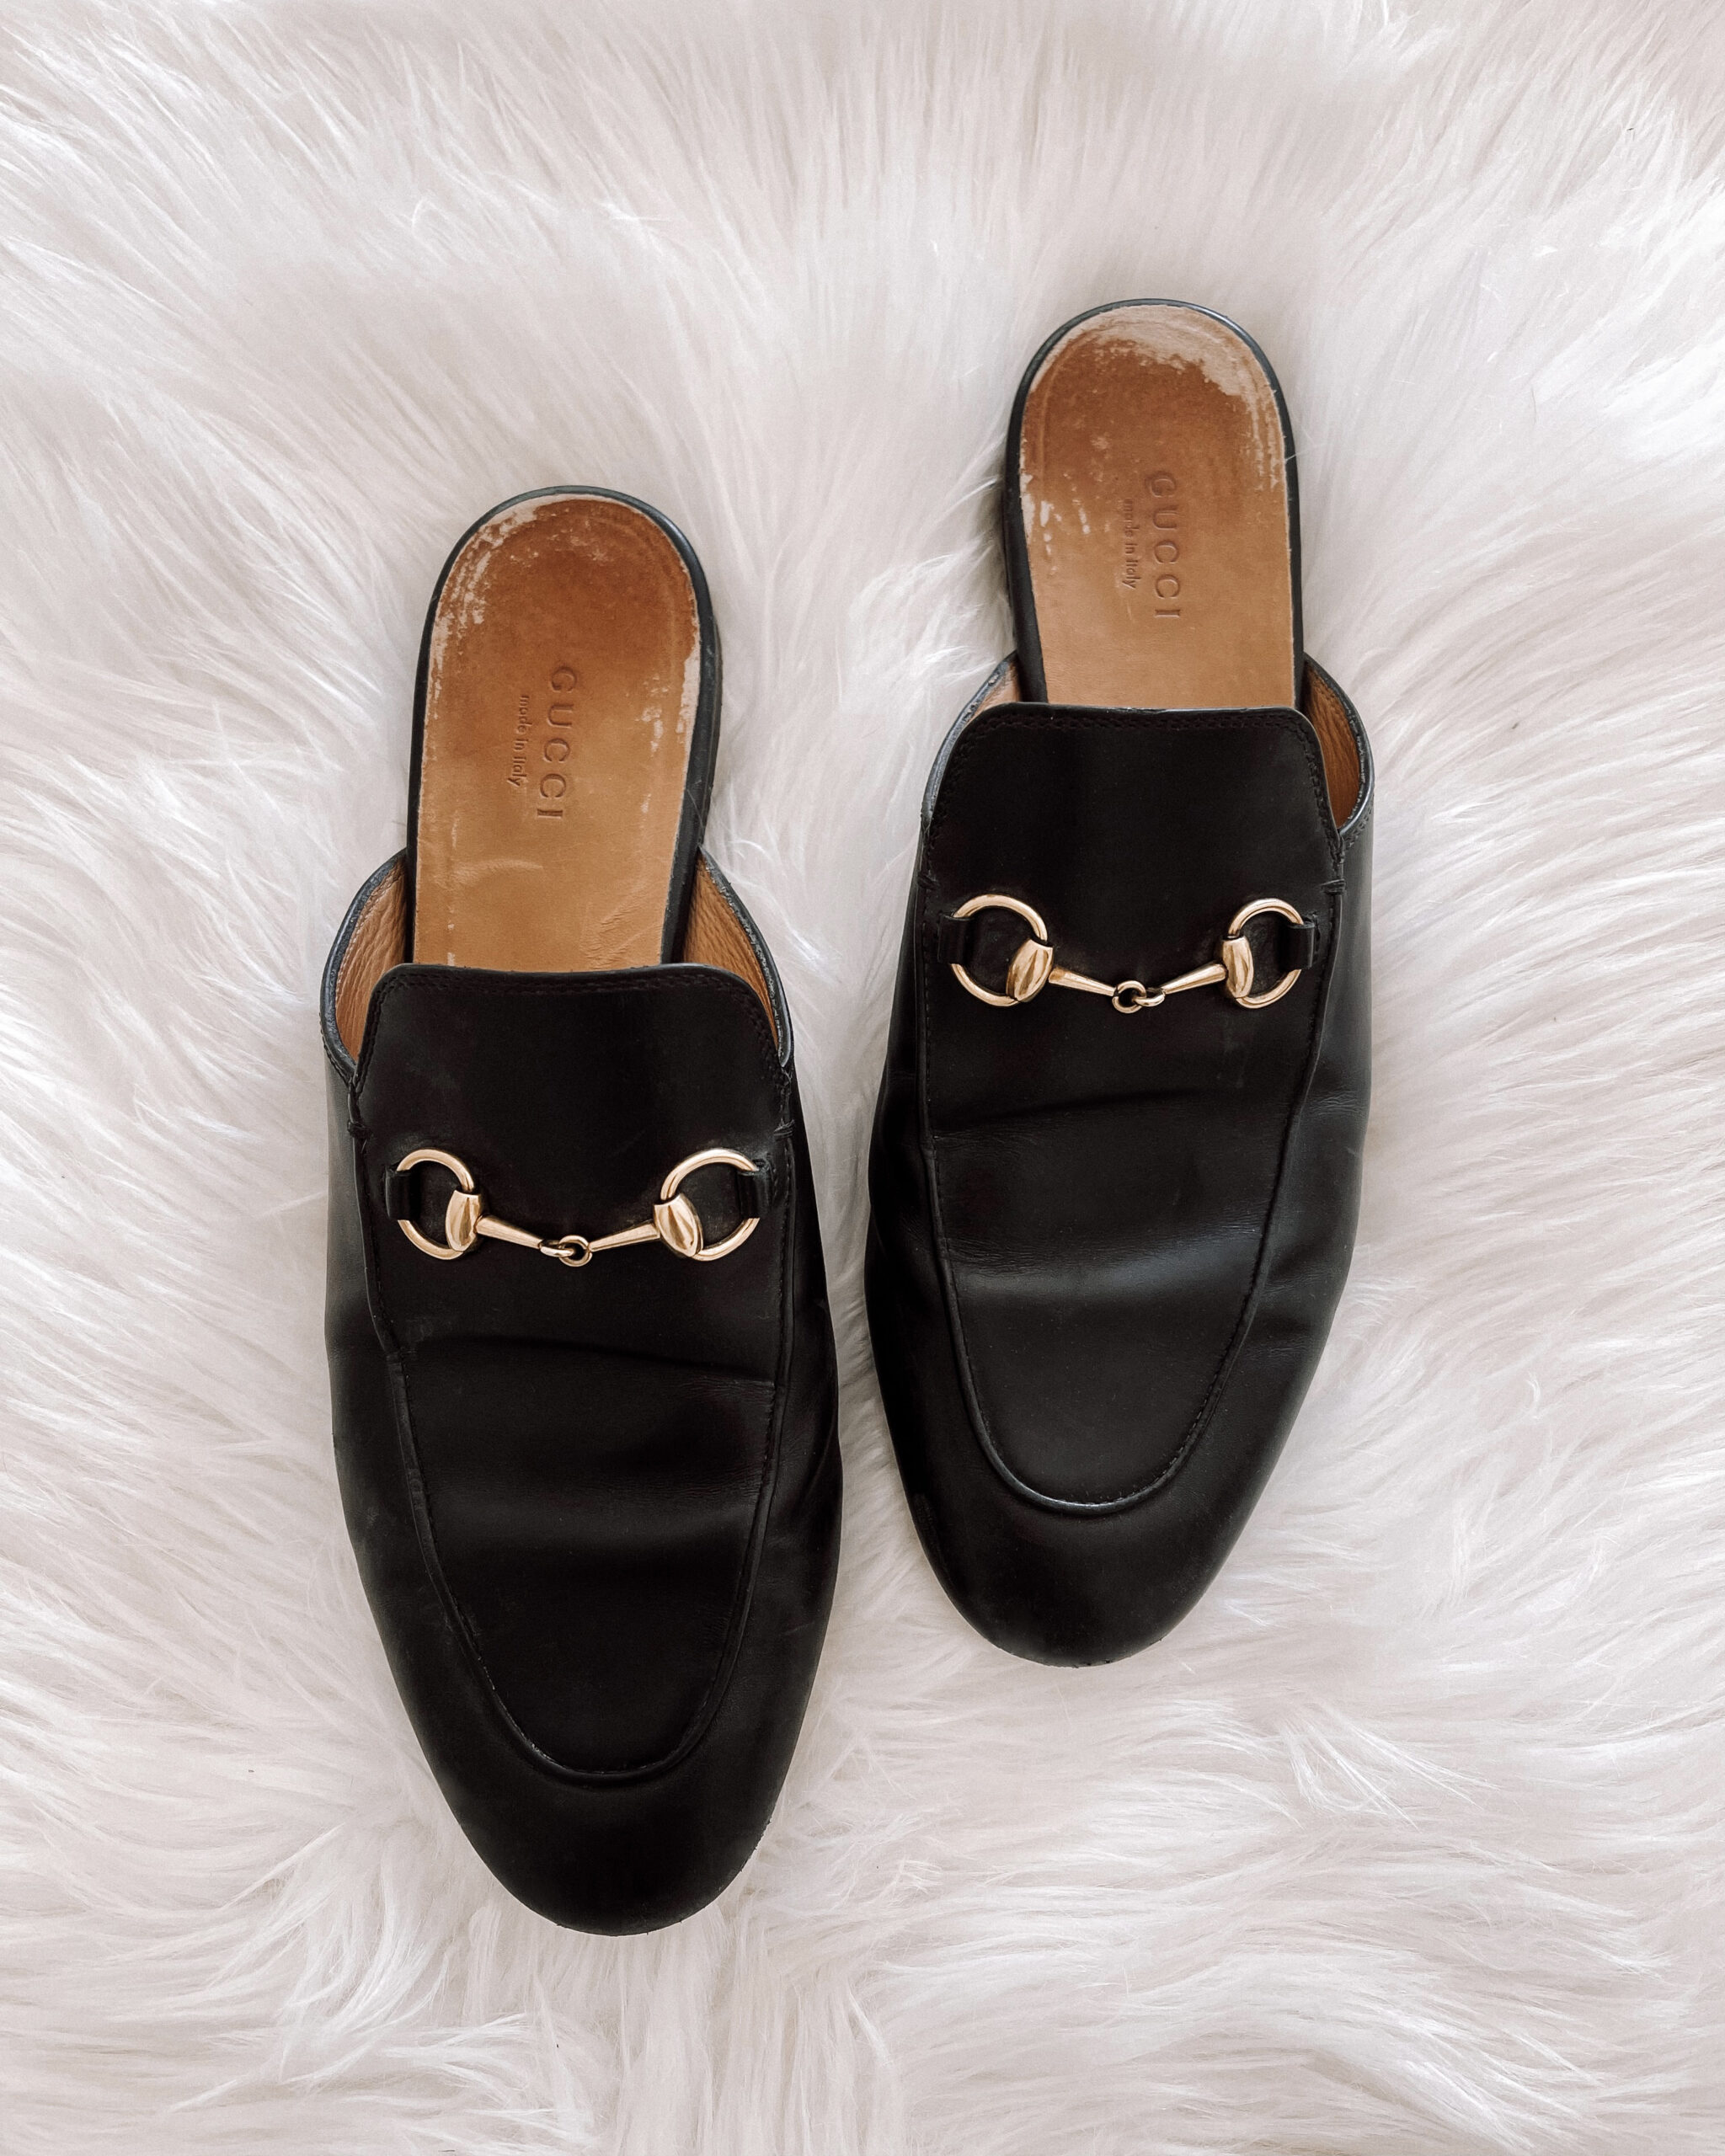 Fashion Jackson Black Gucci Princetown Mules